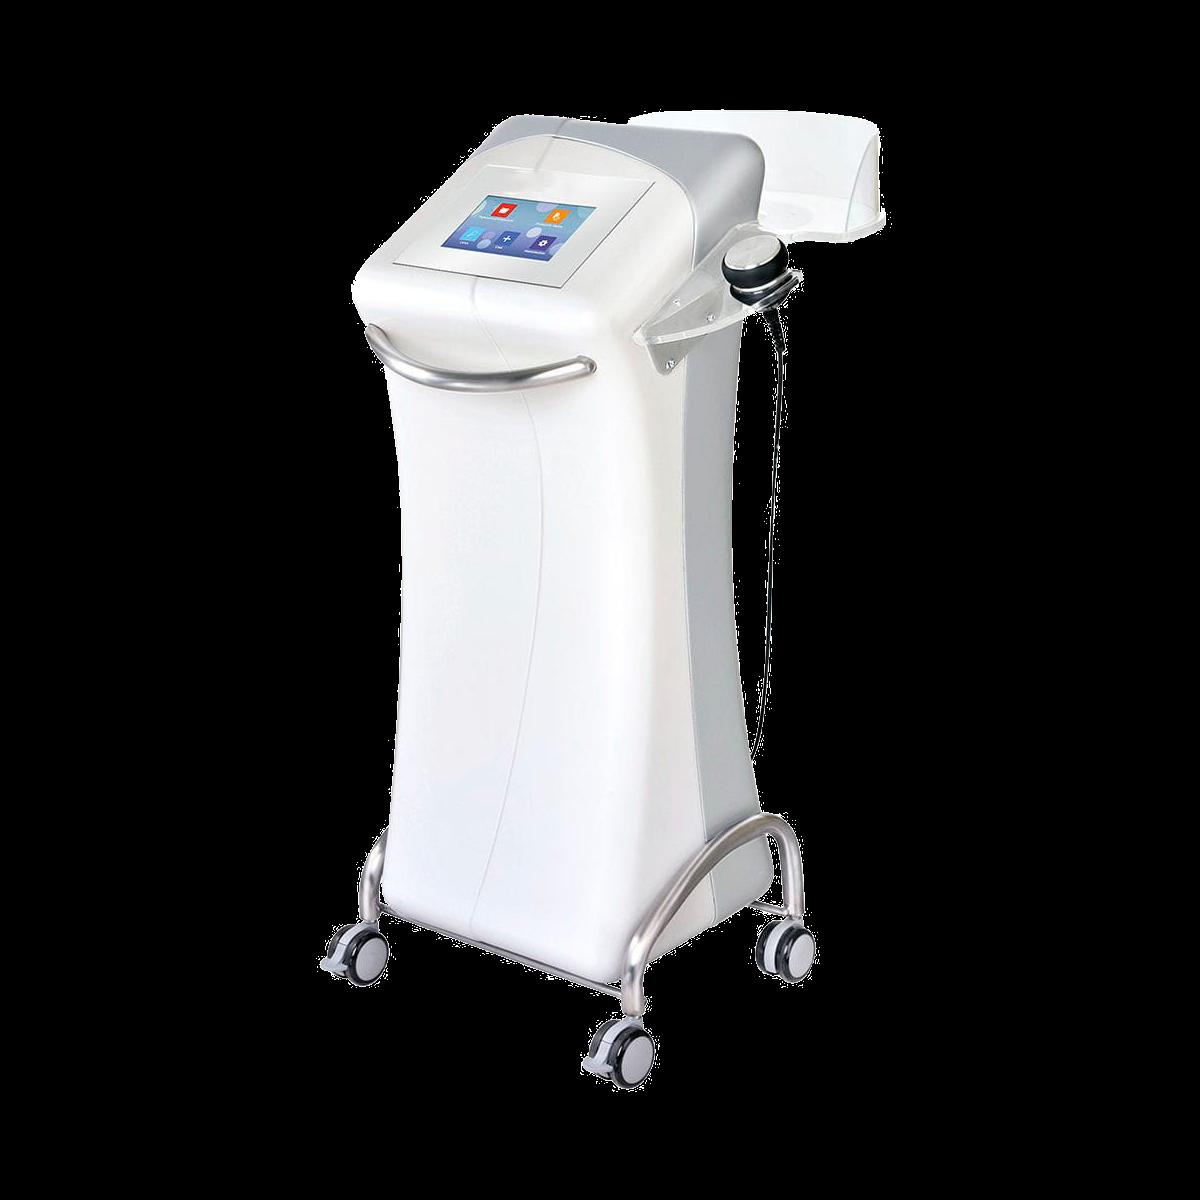 Ultrasound generator